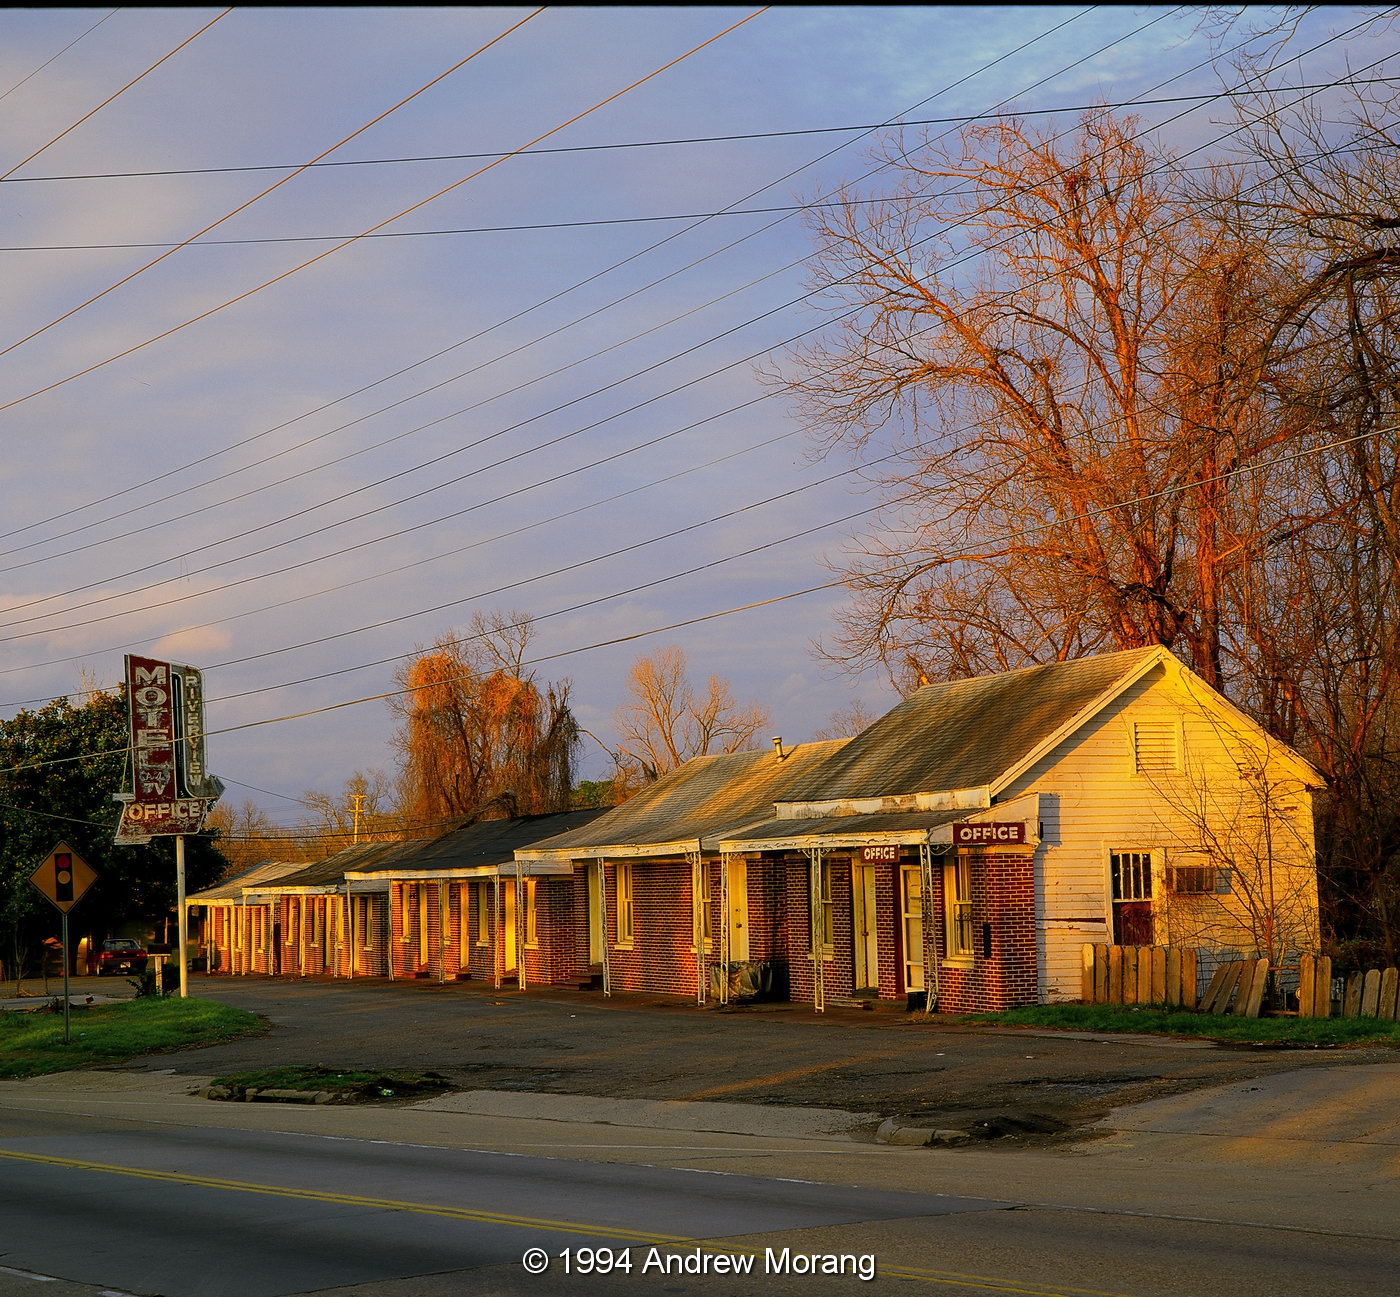 Urban Decay: Washington Street Motels, Vicksburg, Mississippi